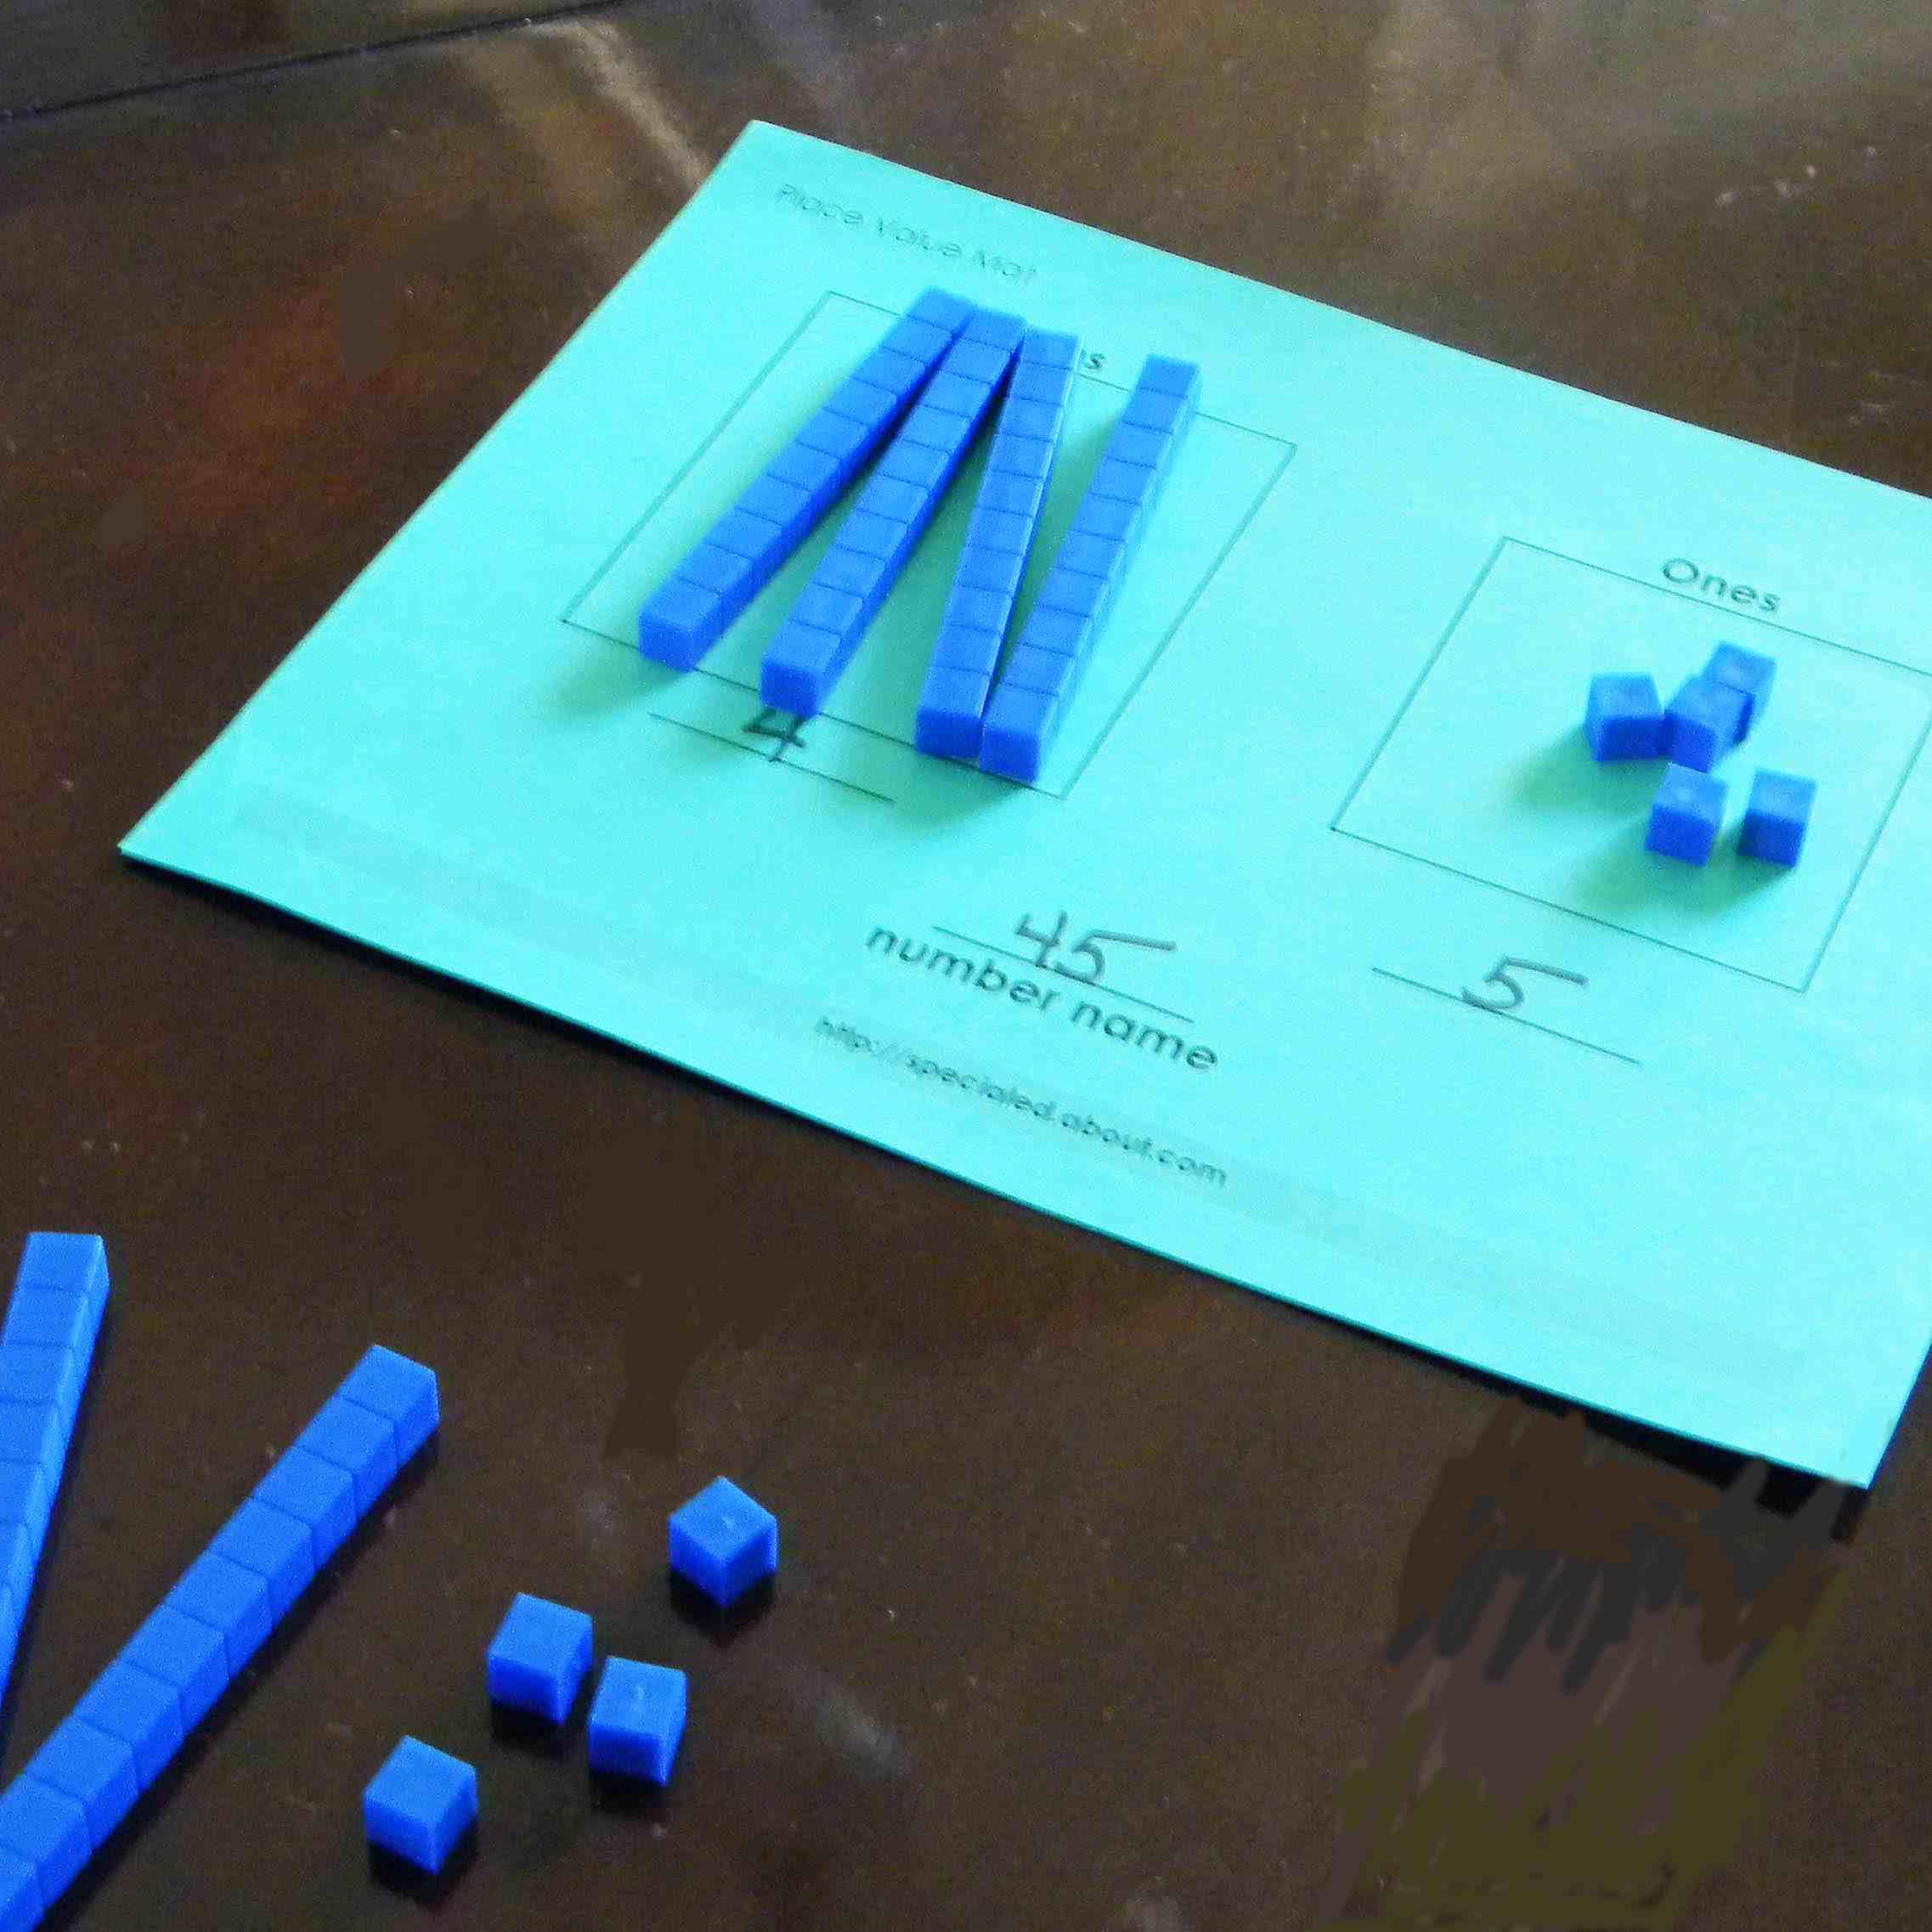 Place value sticks and worksheet on a student desk.